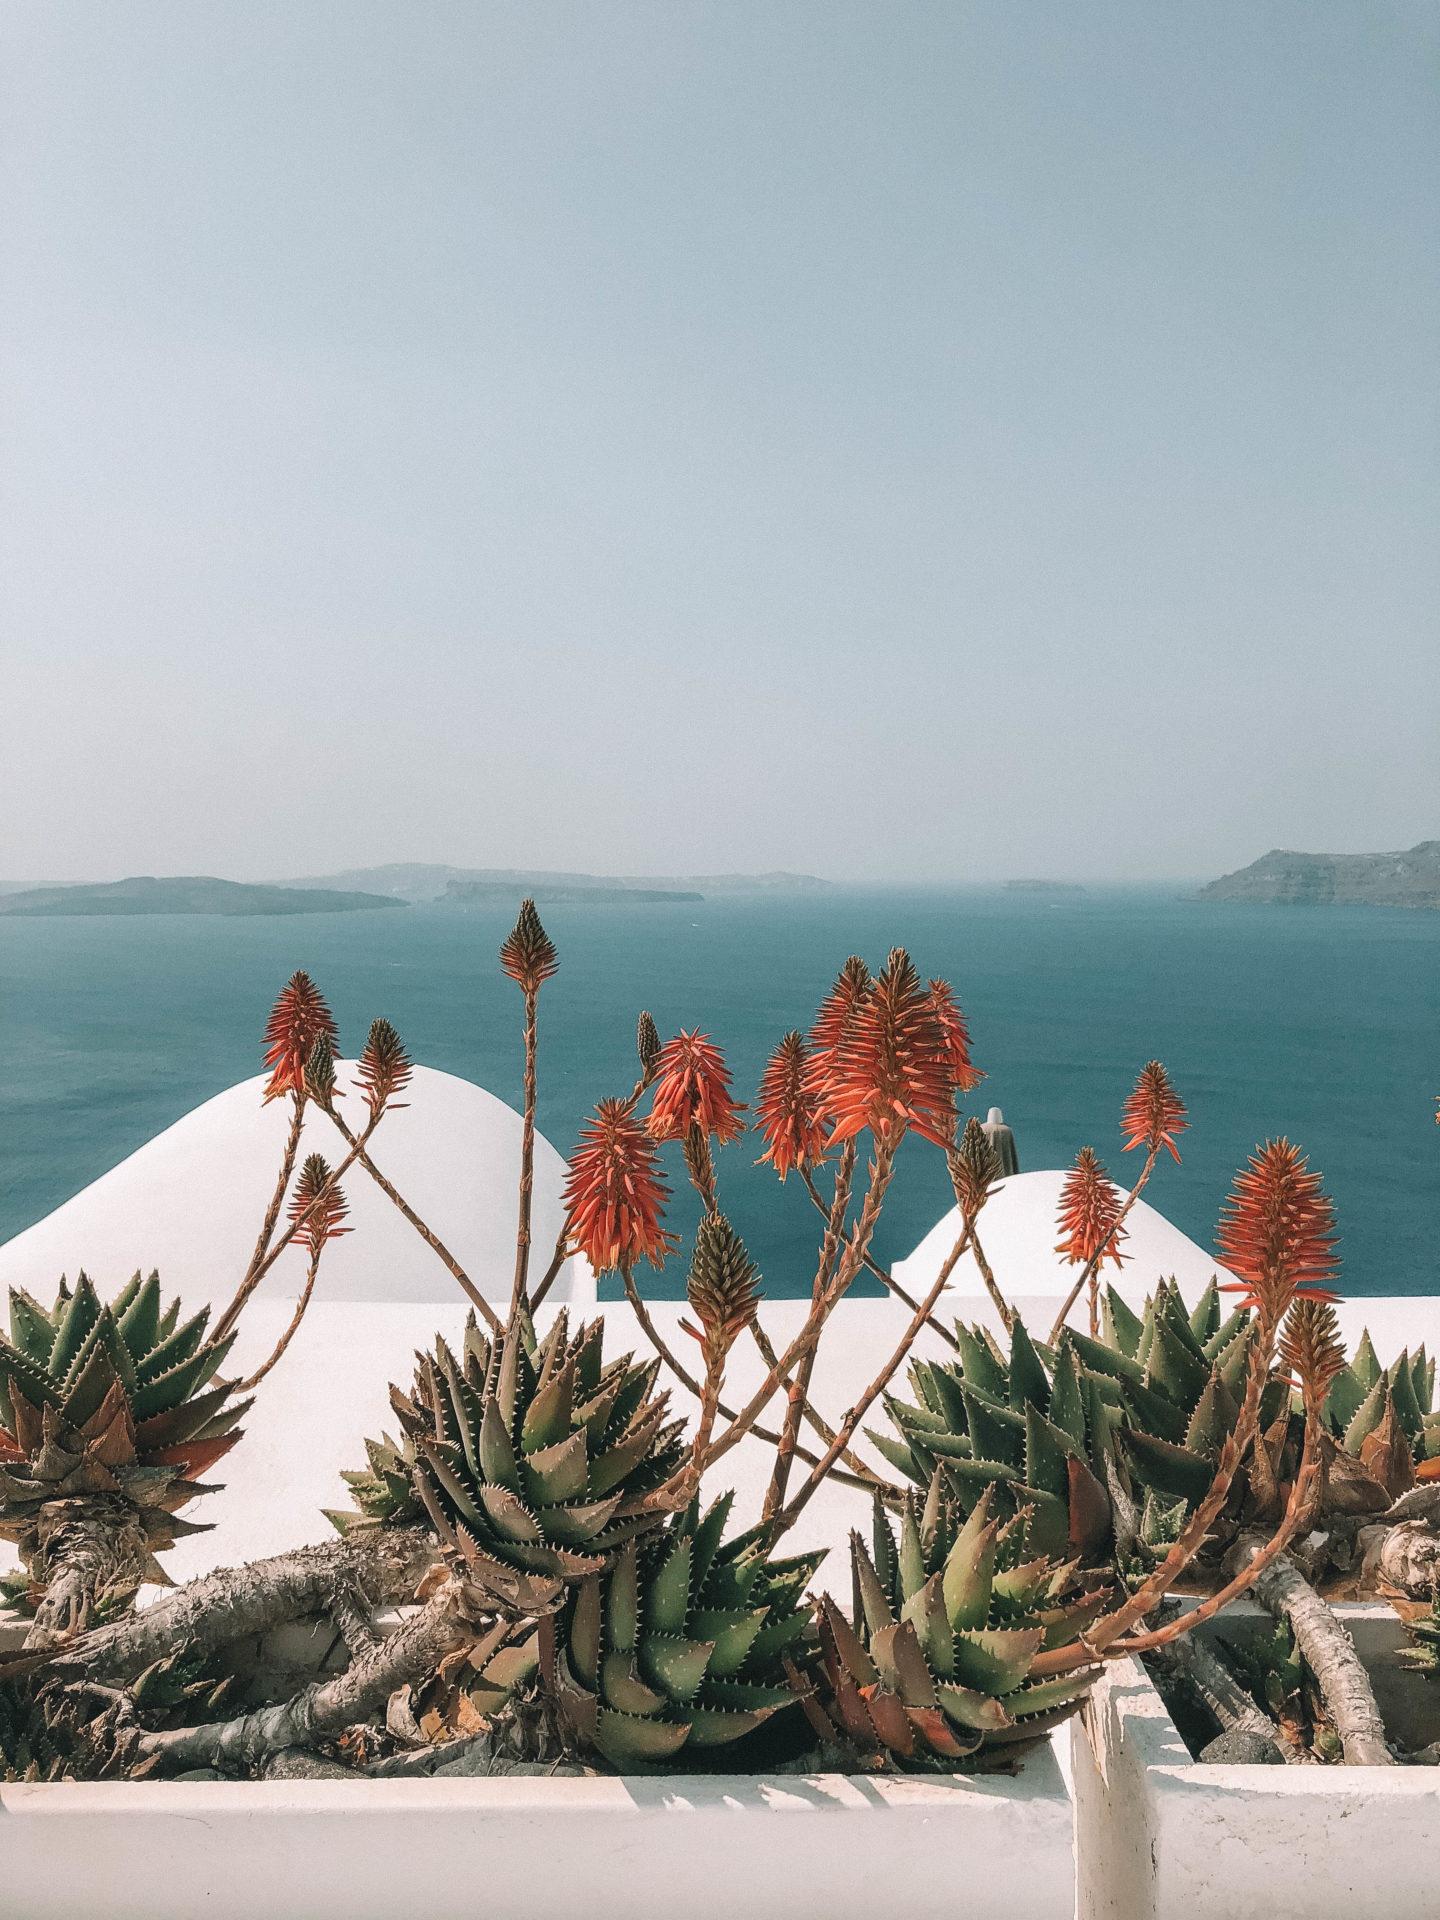 Santorini, Grèce - Blondie Baby blog mode et voyages